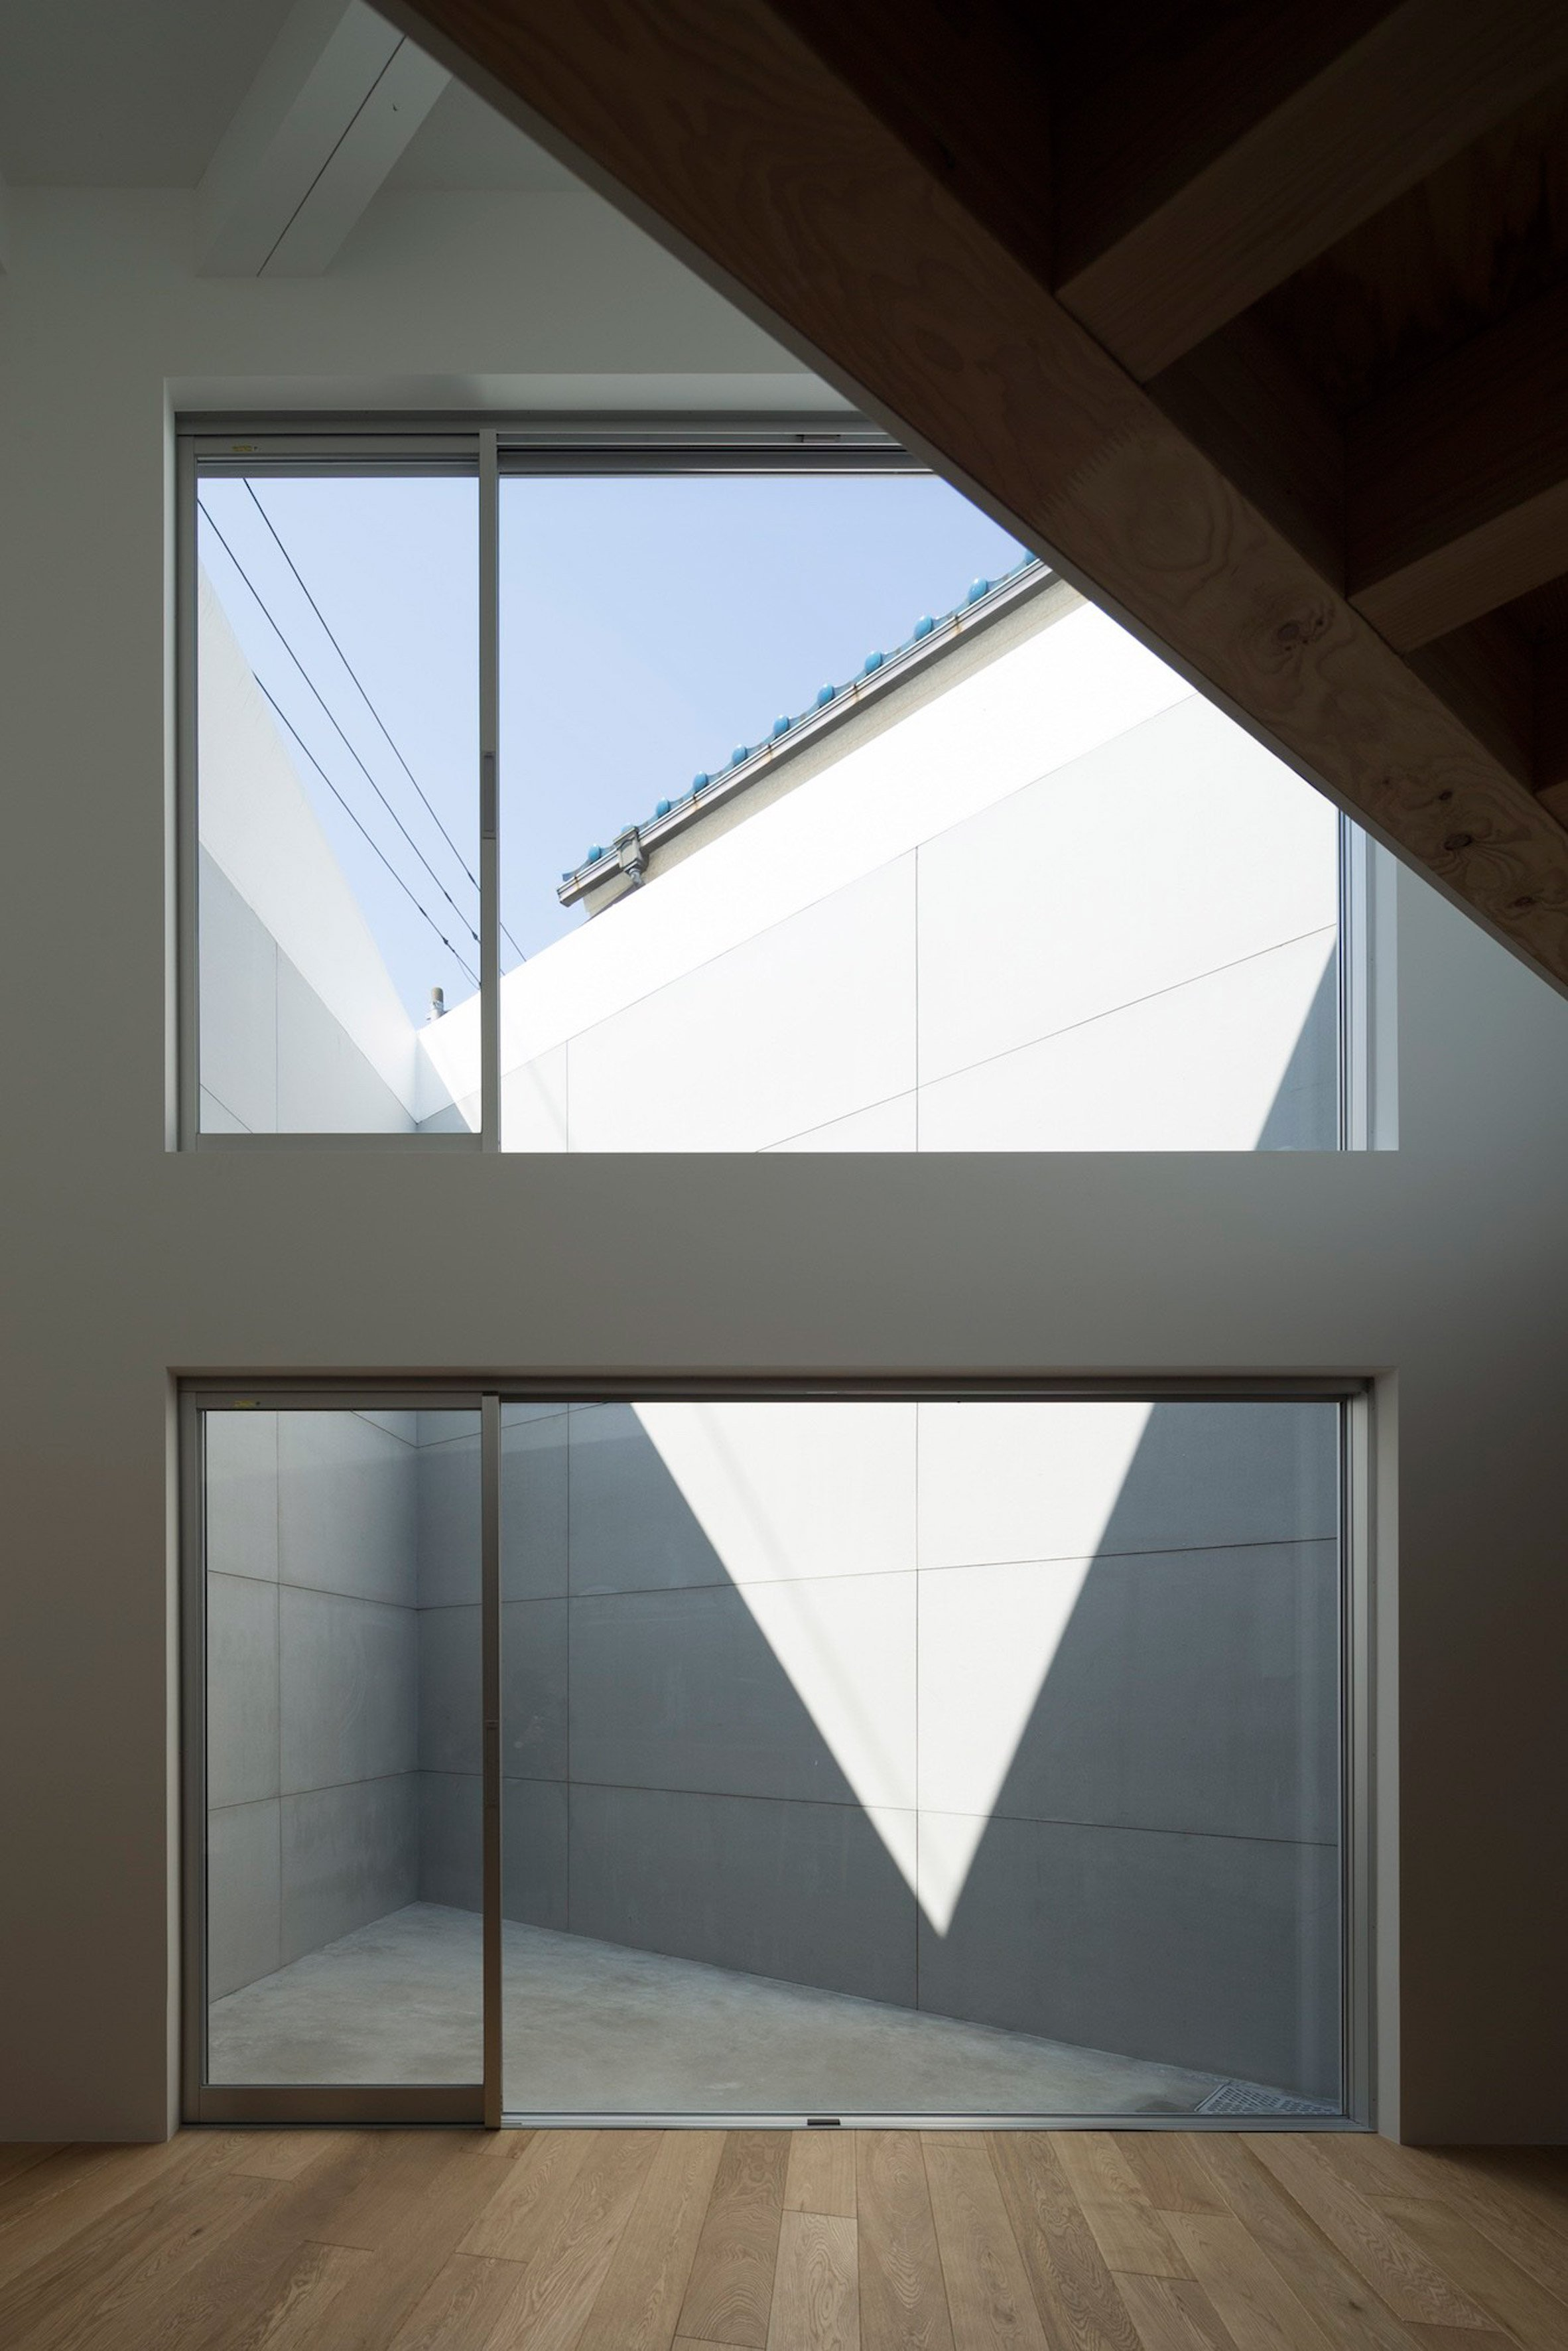 Kamiuma House by Hiroo Okubo and CHOP+ARCHI